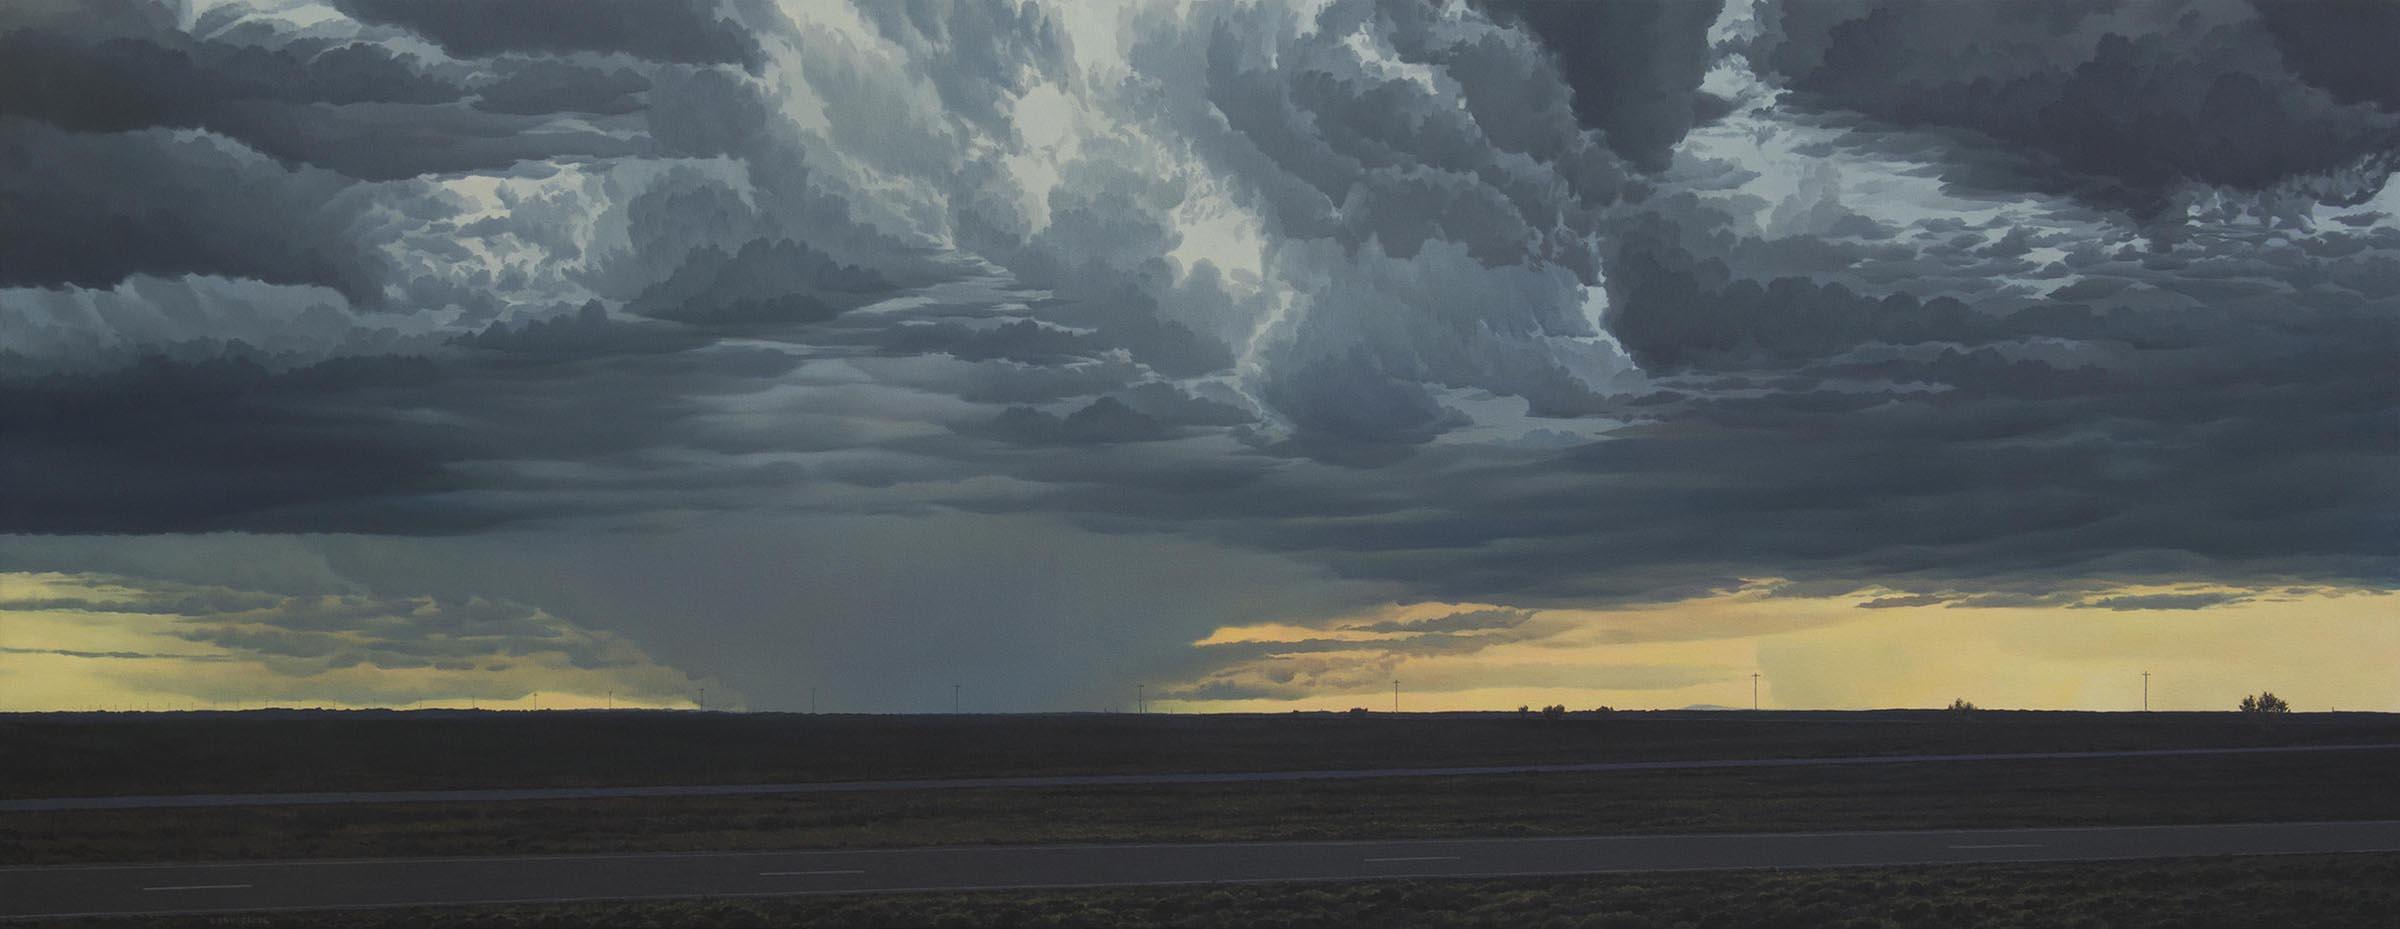 Pat Gabriel, Rain and Light, 2016